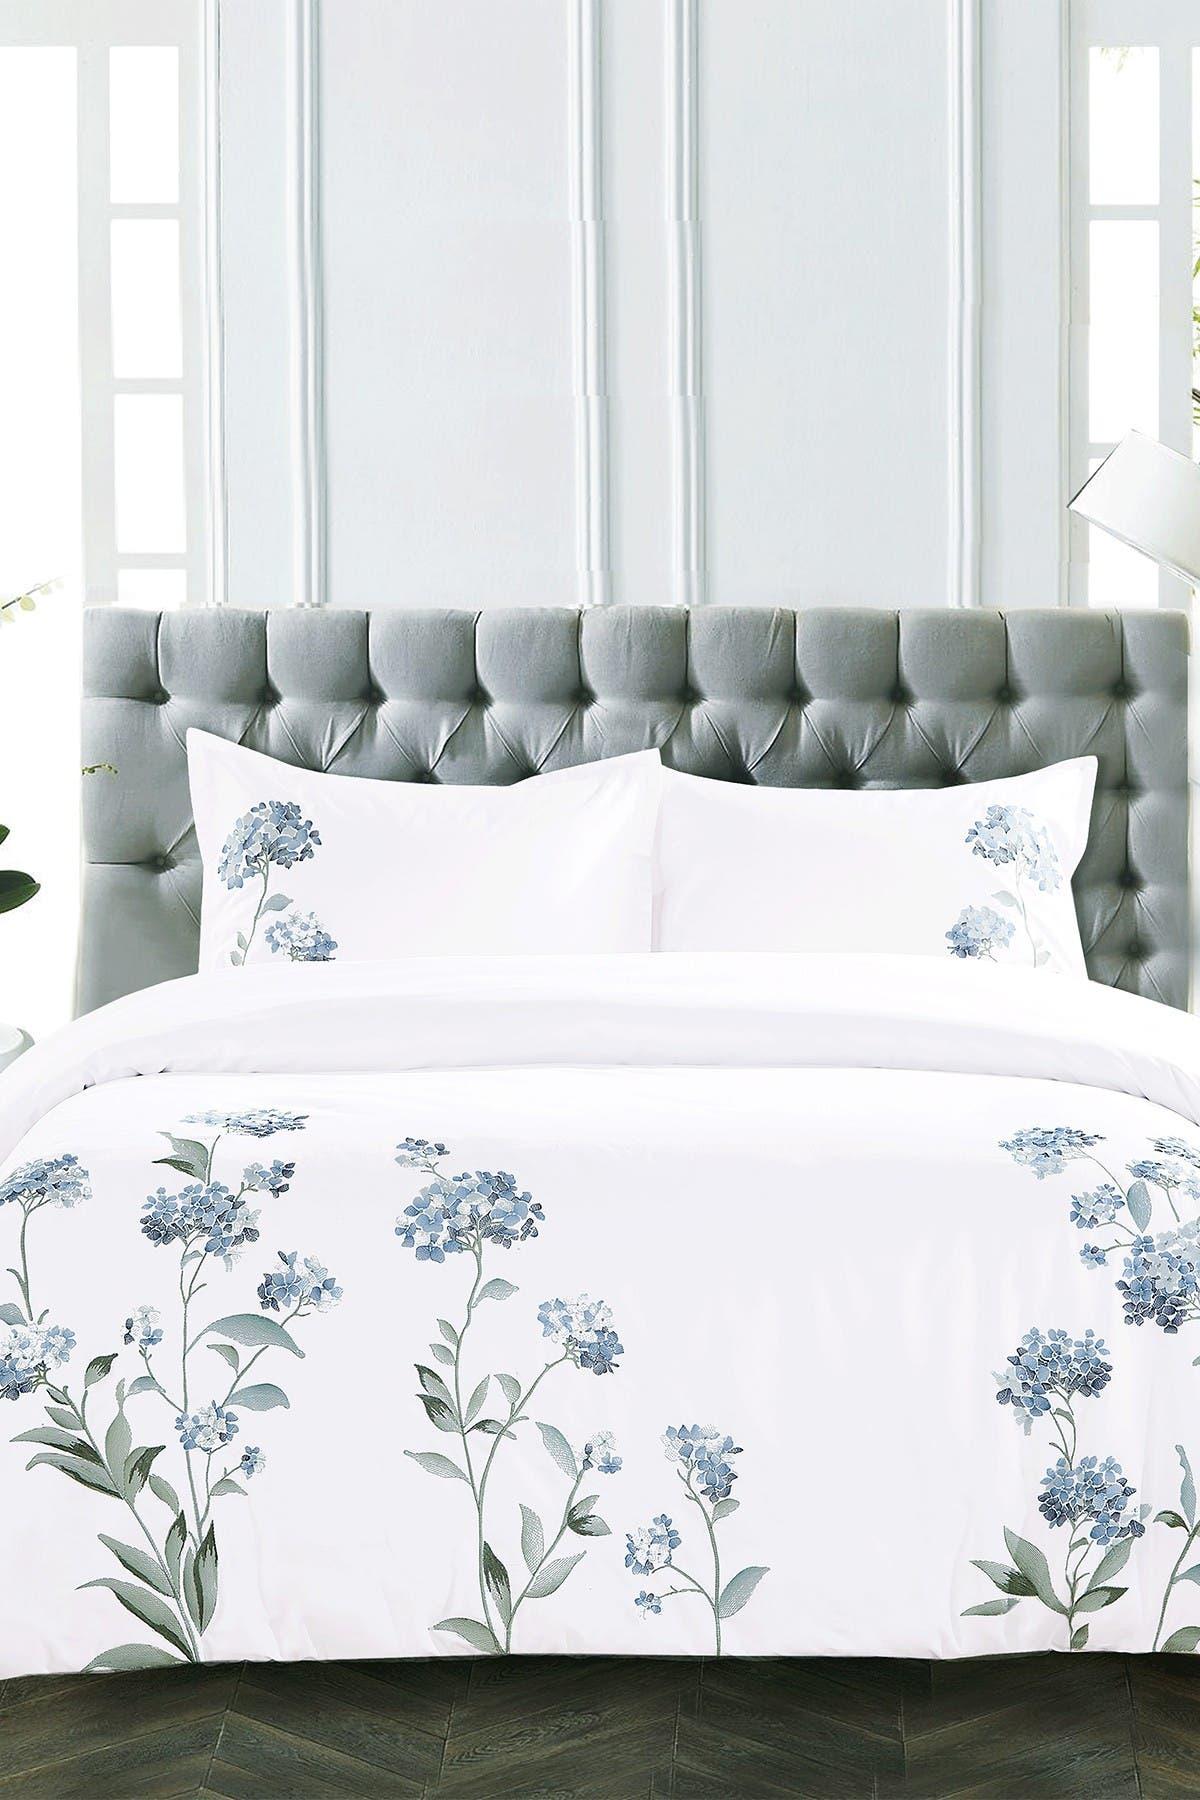 Image of Melange Home King Hydrangea Embroidered Duvet Set - White